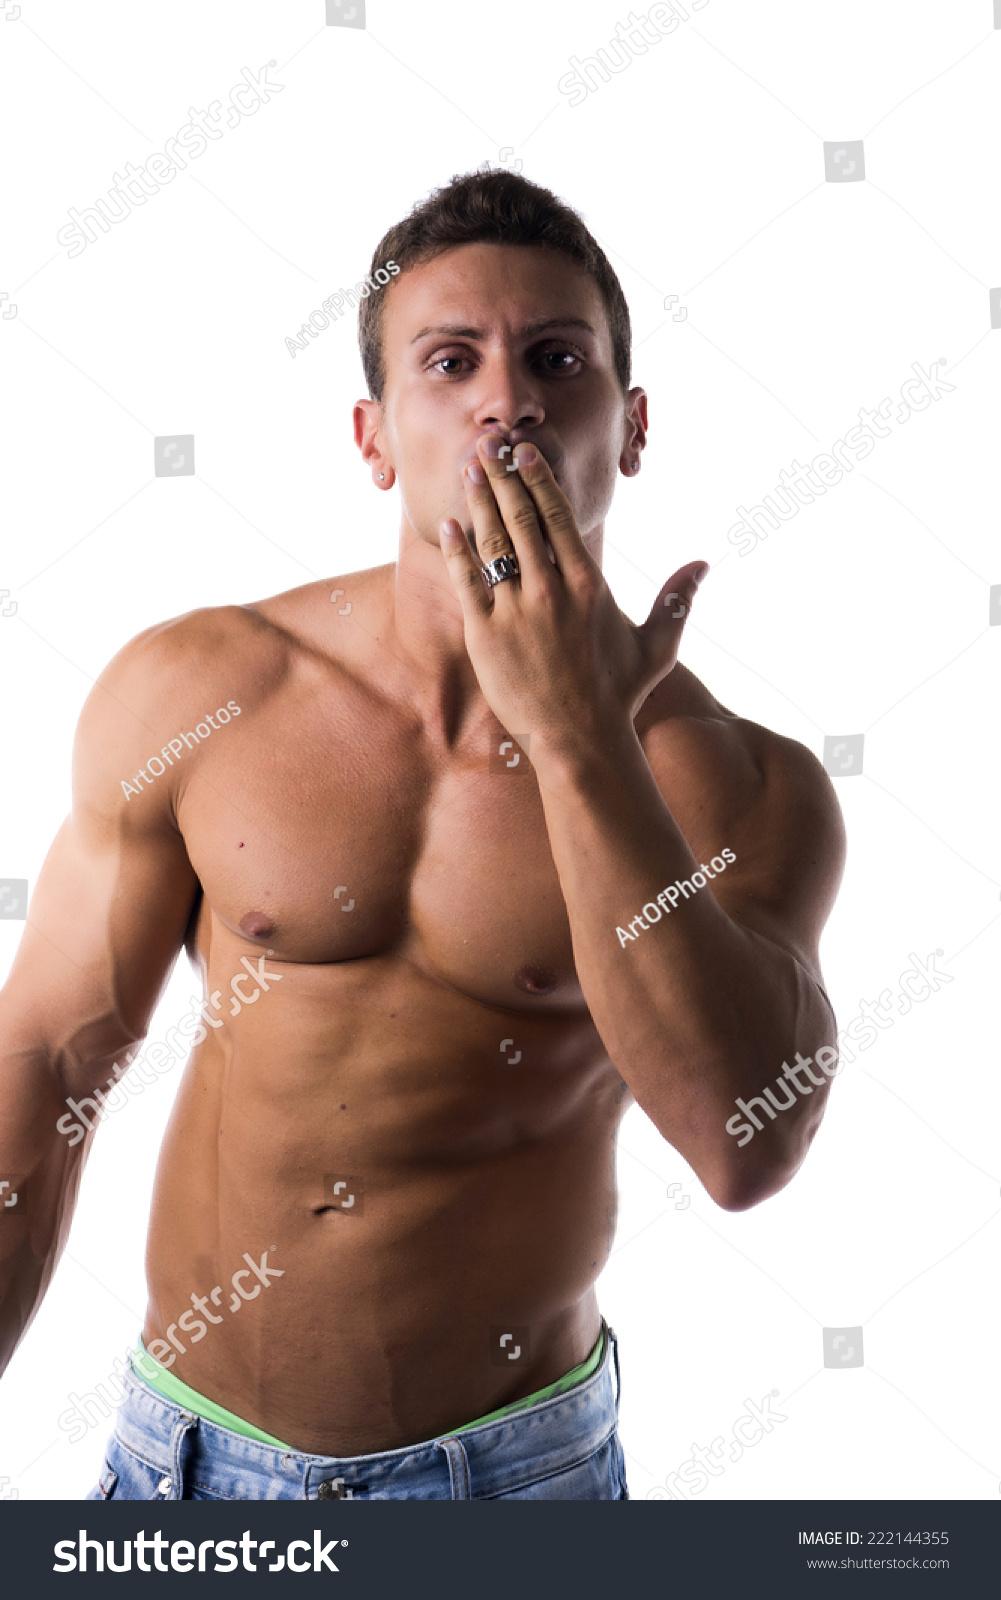 liberator position sexual